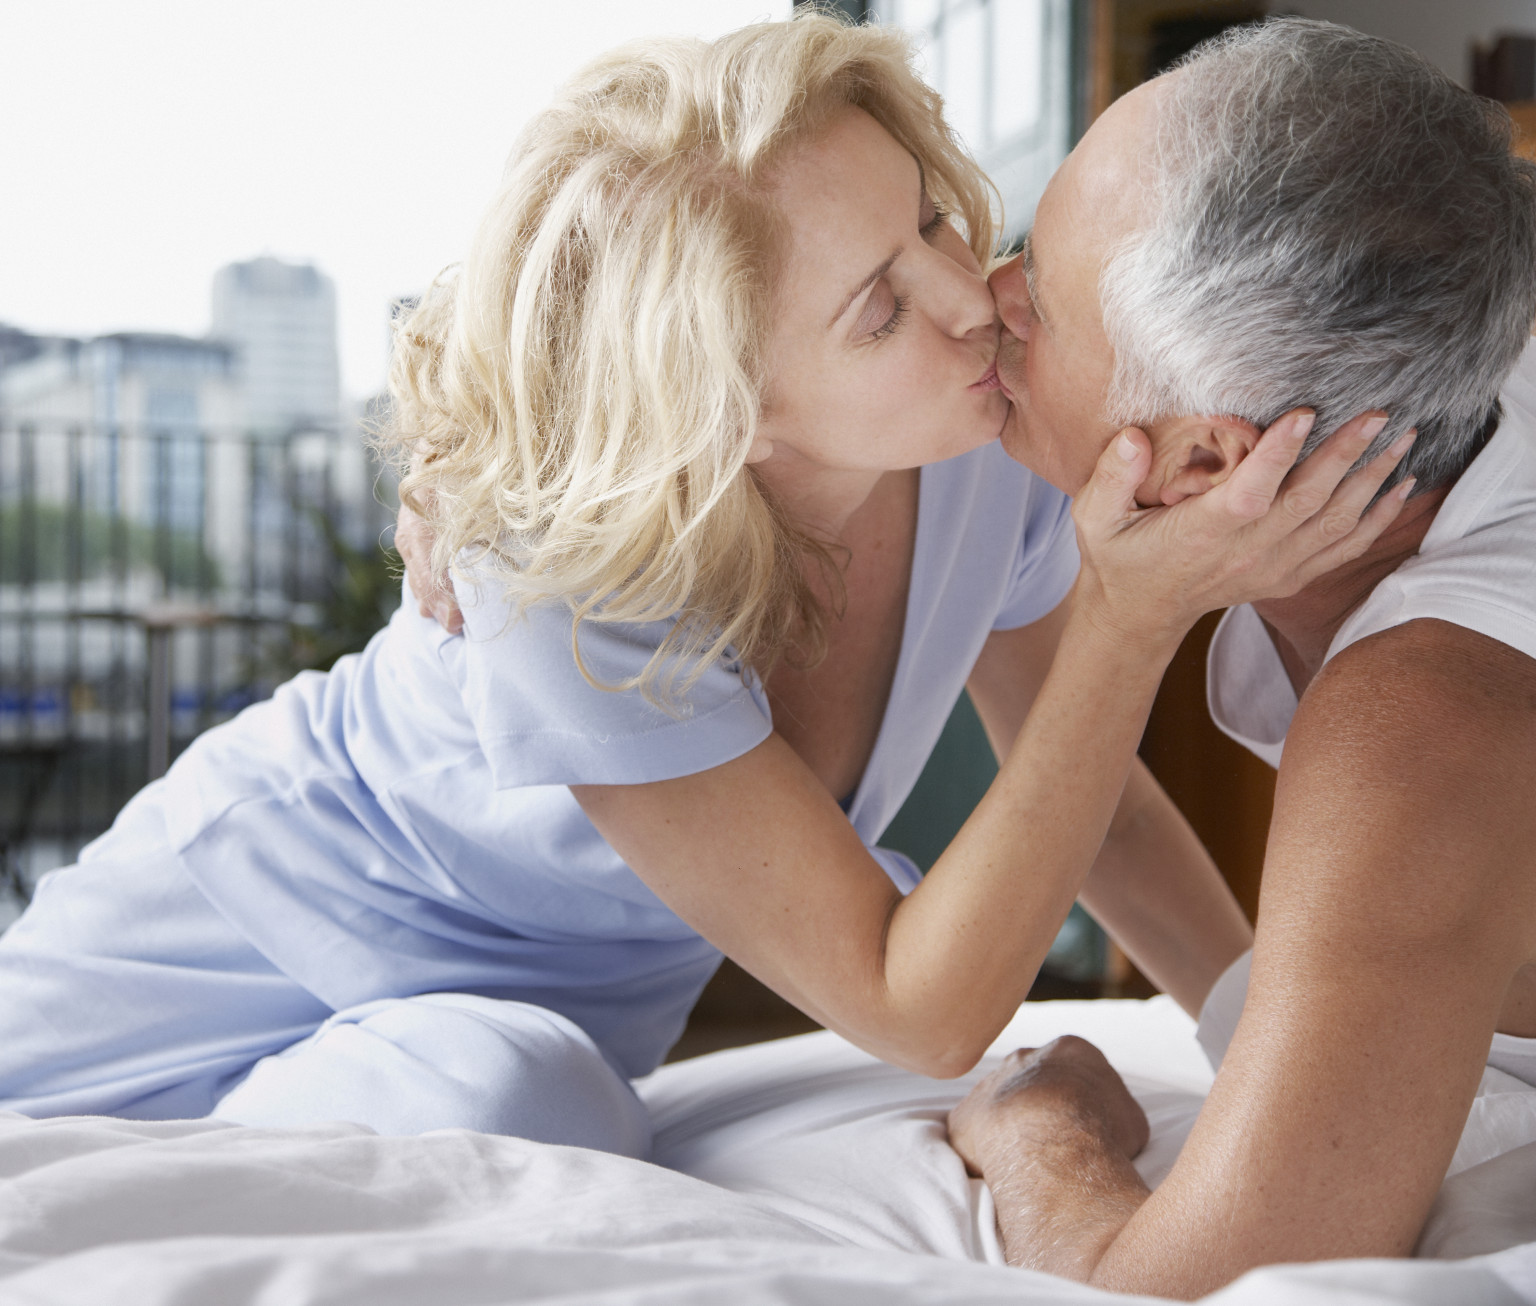 55 To 60 One-night Stand Divorced Woman Seeking Man